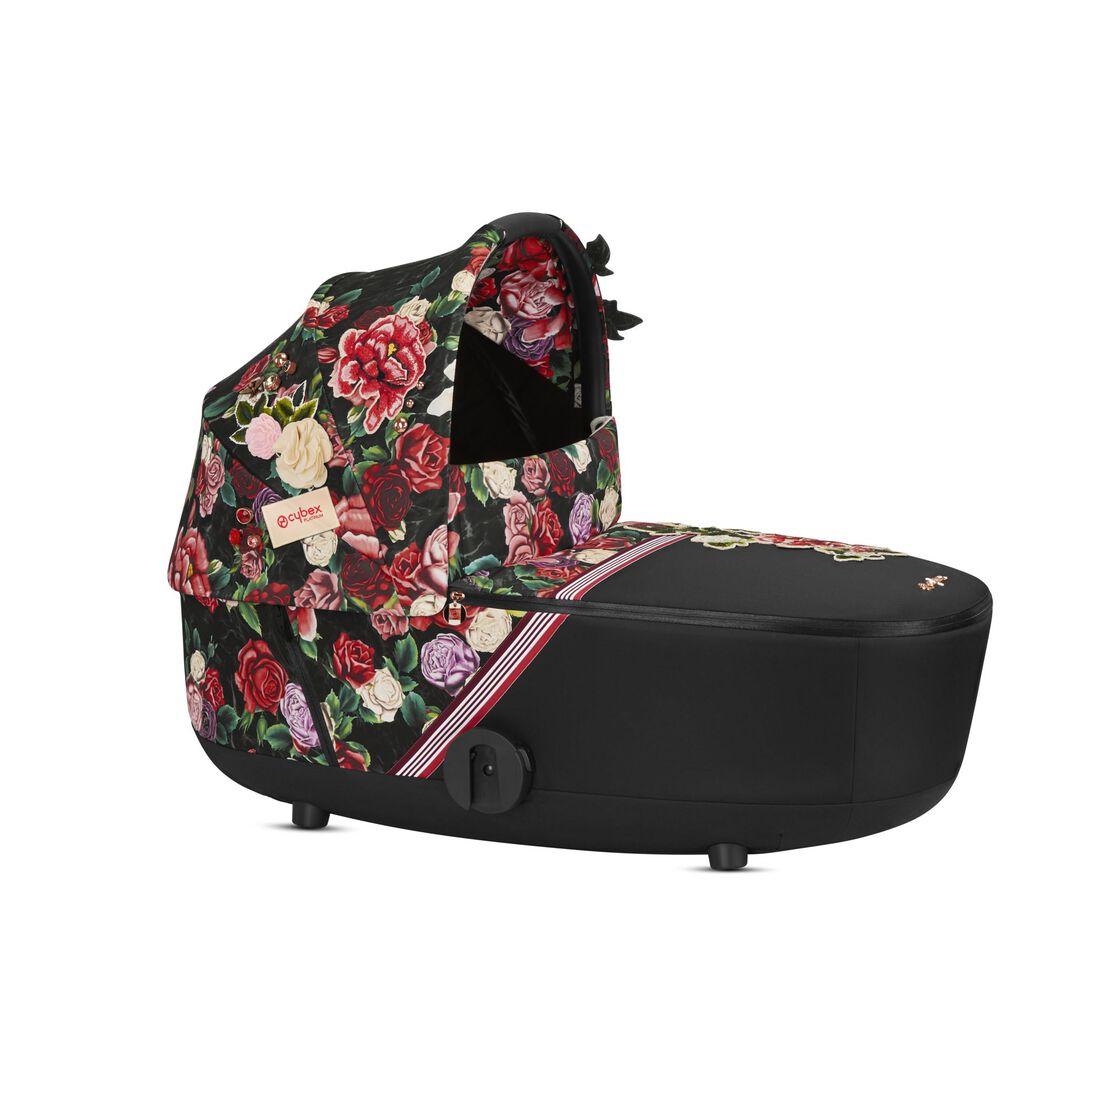 CYBEX Mios Lux Carry Cot - Spring Blossom Dark in Spring Blossom Dark large Bild 1